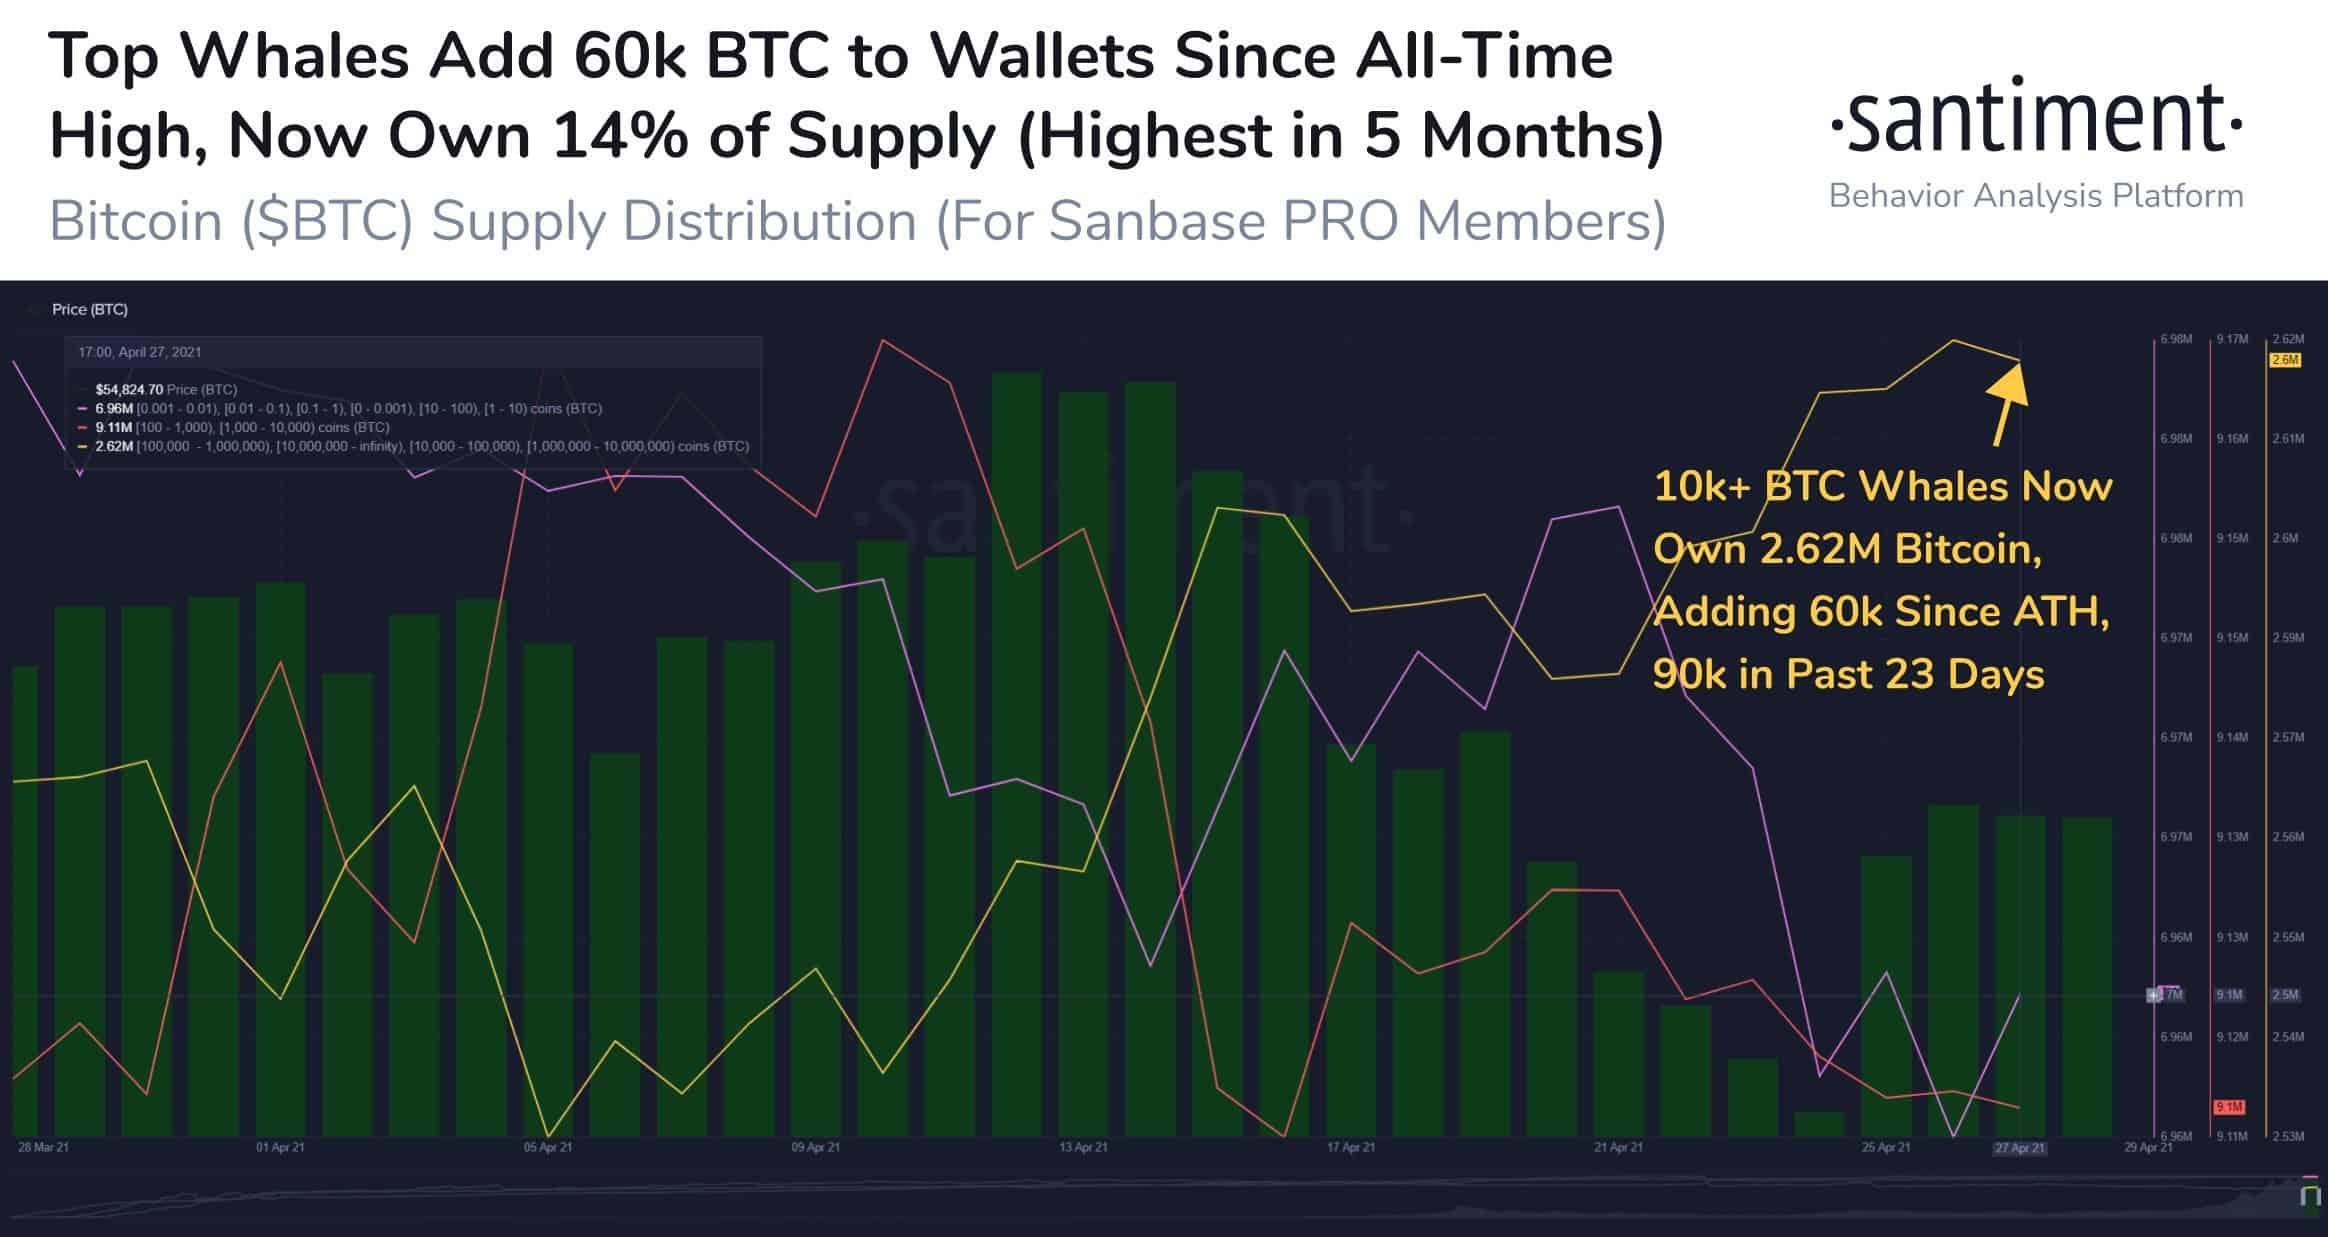 Bitcoin Price vs. Bitcoin Whales' Behavior. Source: Santiment